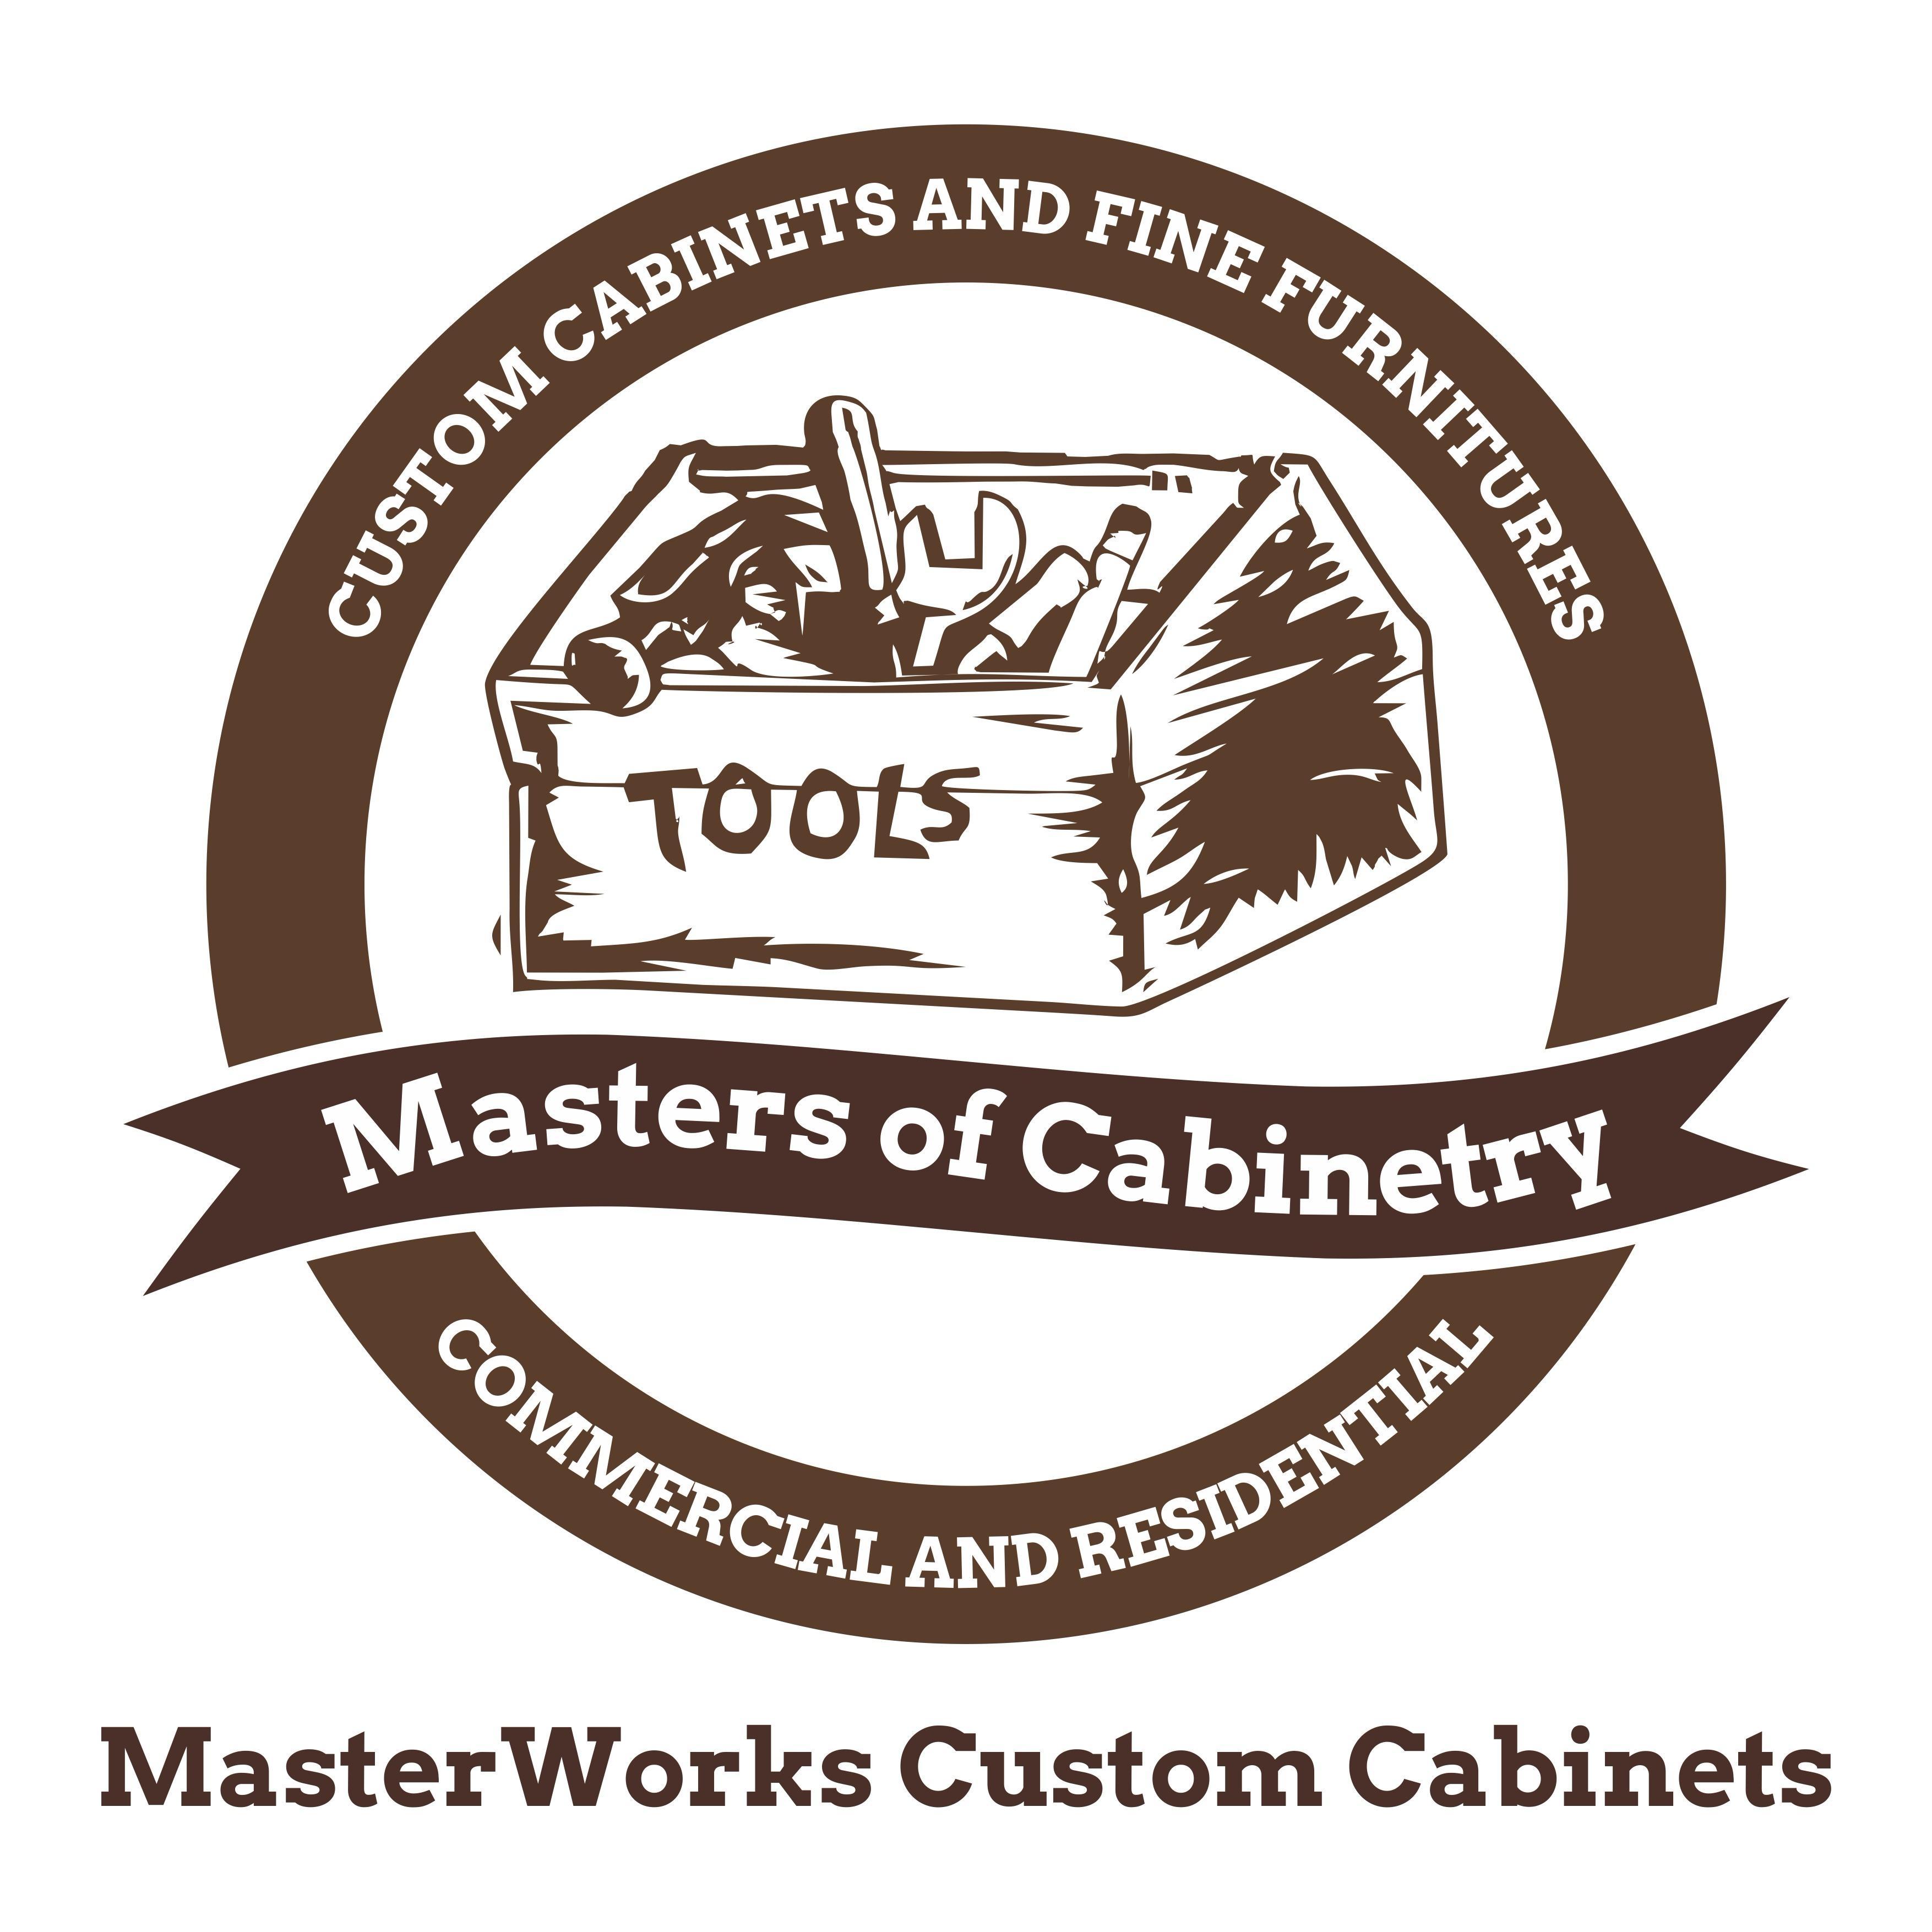 MasterWorks Custom Cabinets